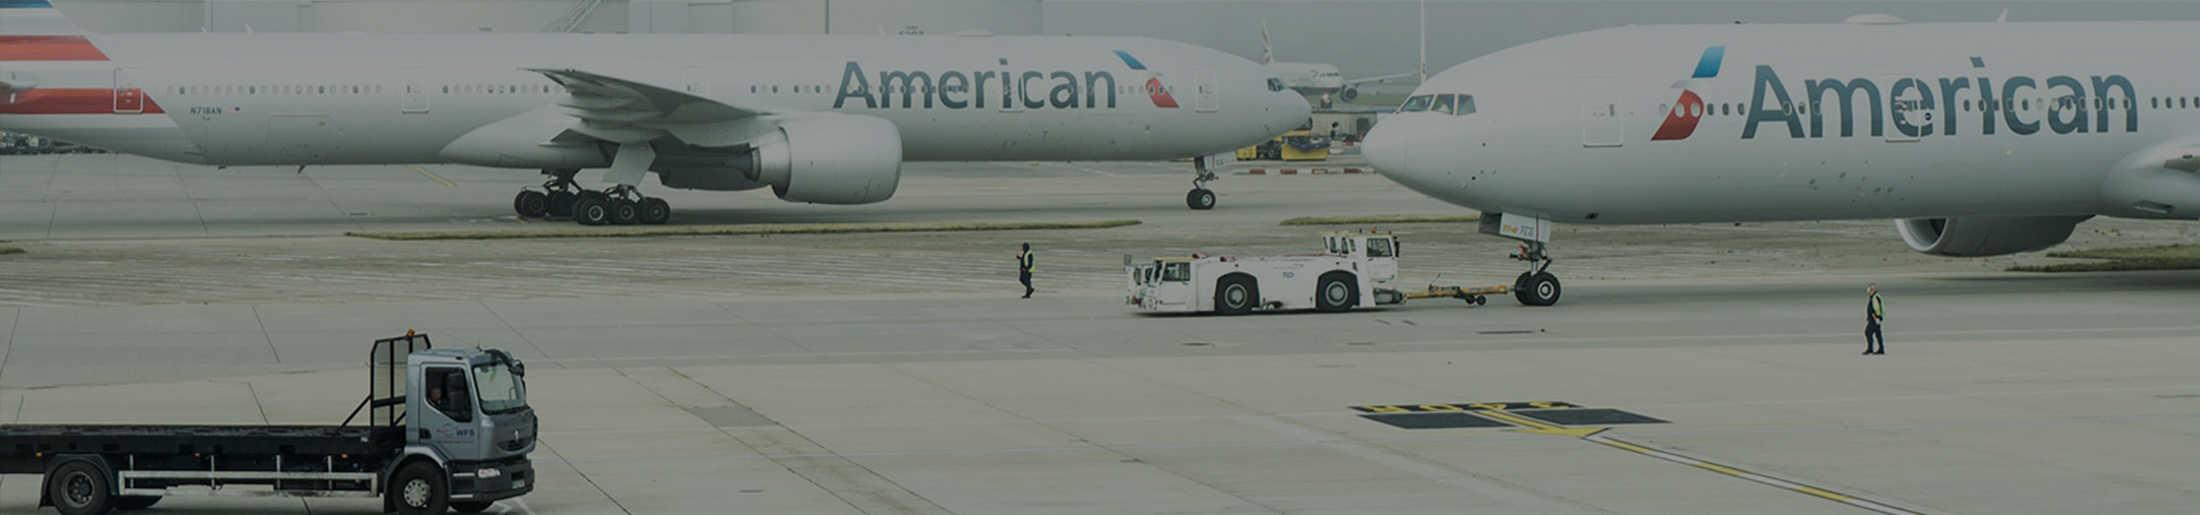 American Airlines Hytera DMR Tier III Header